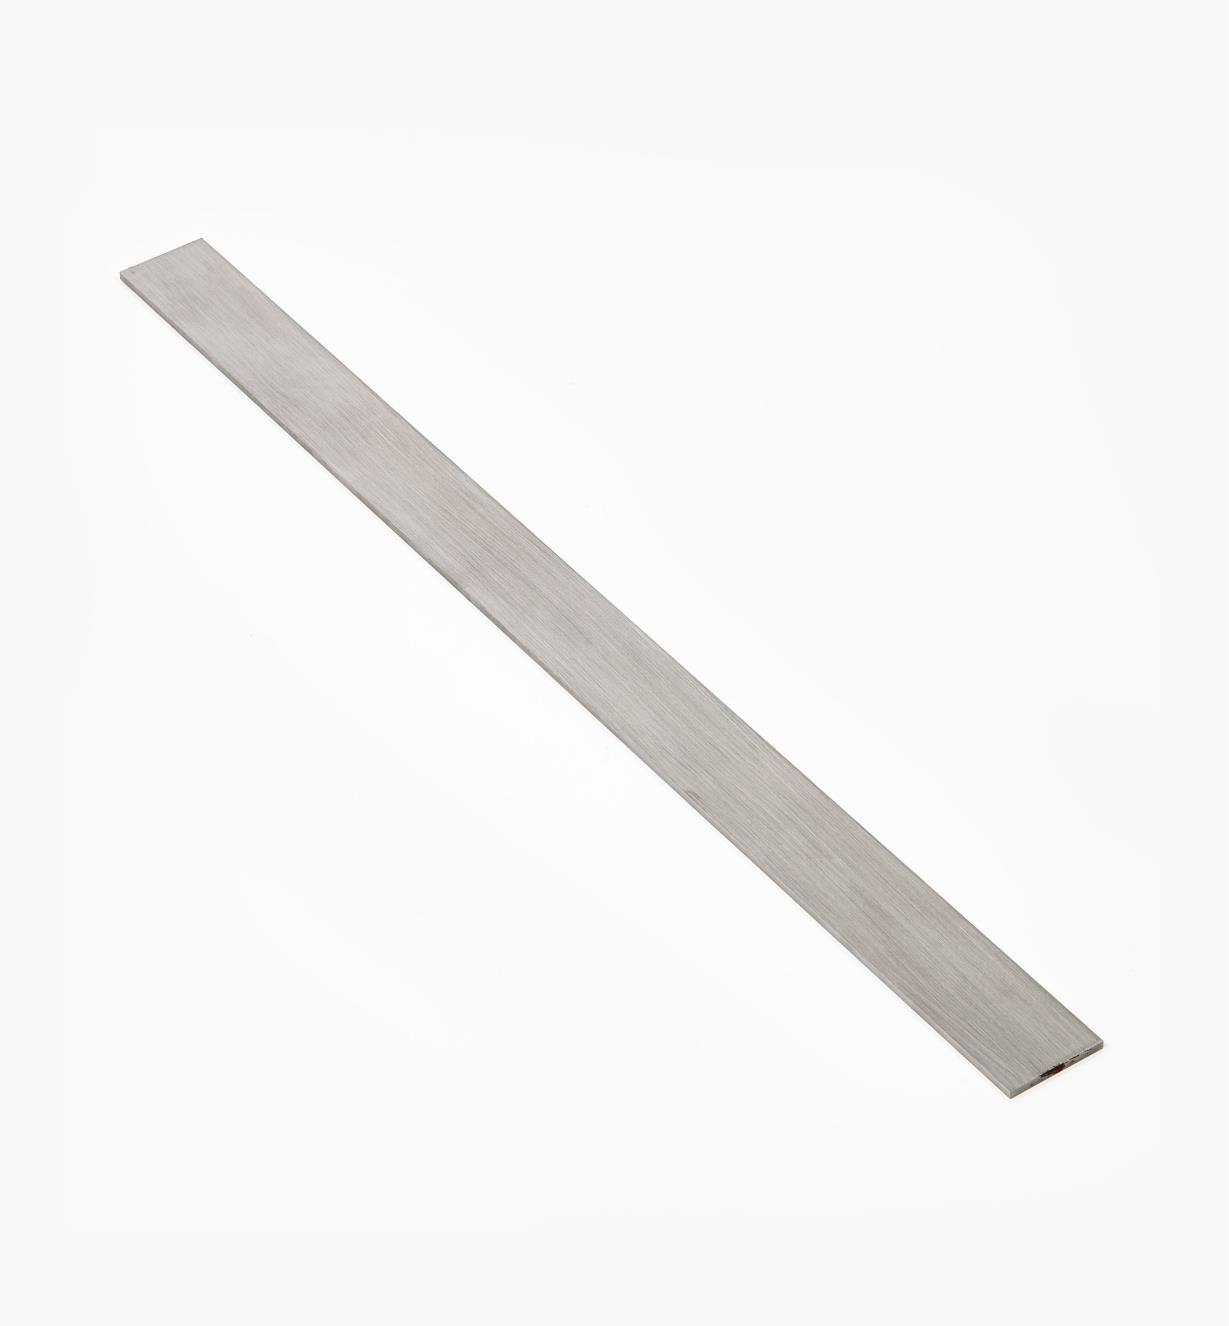 "30N3213 - 36"" Starrett Precision Steel Straightedge"